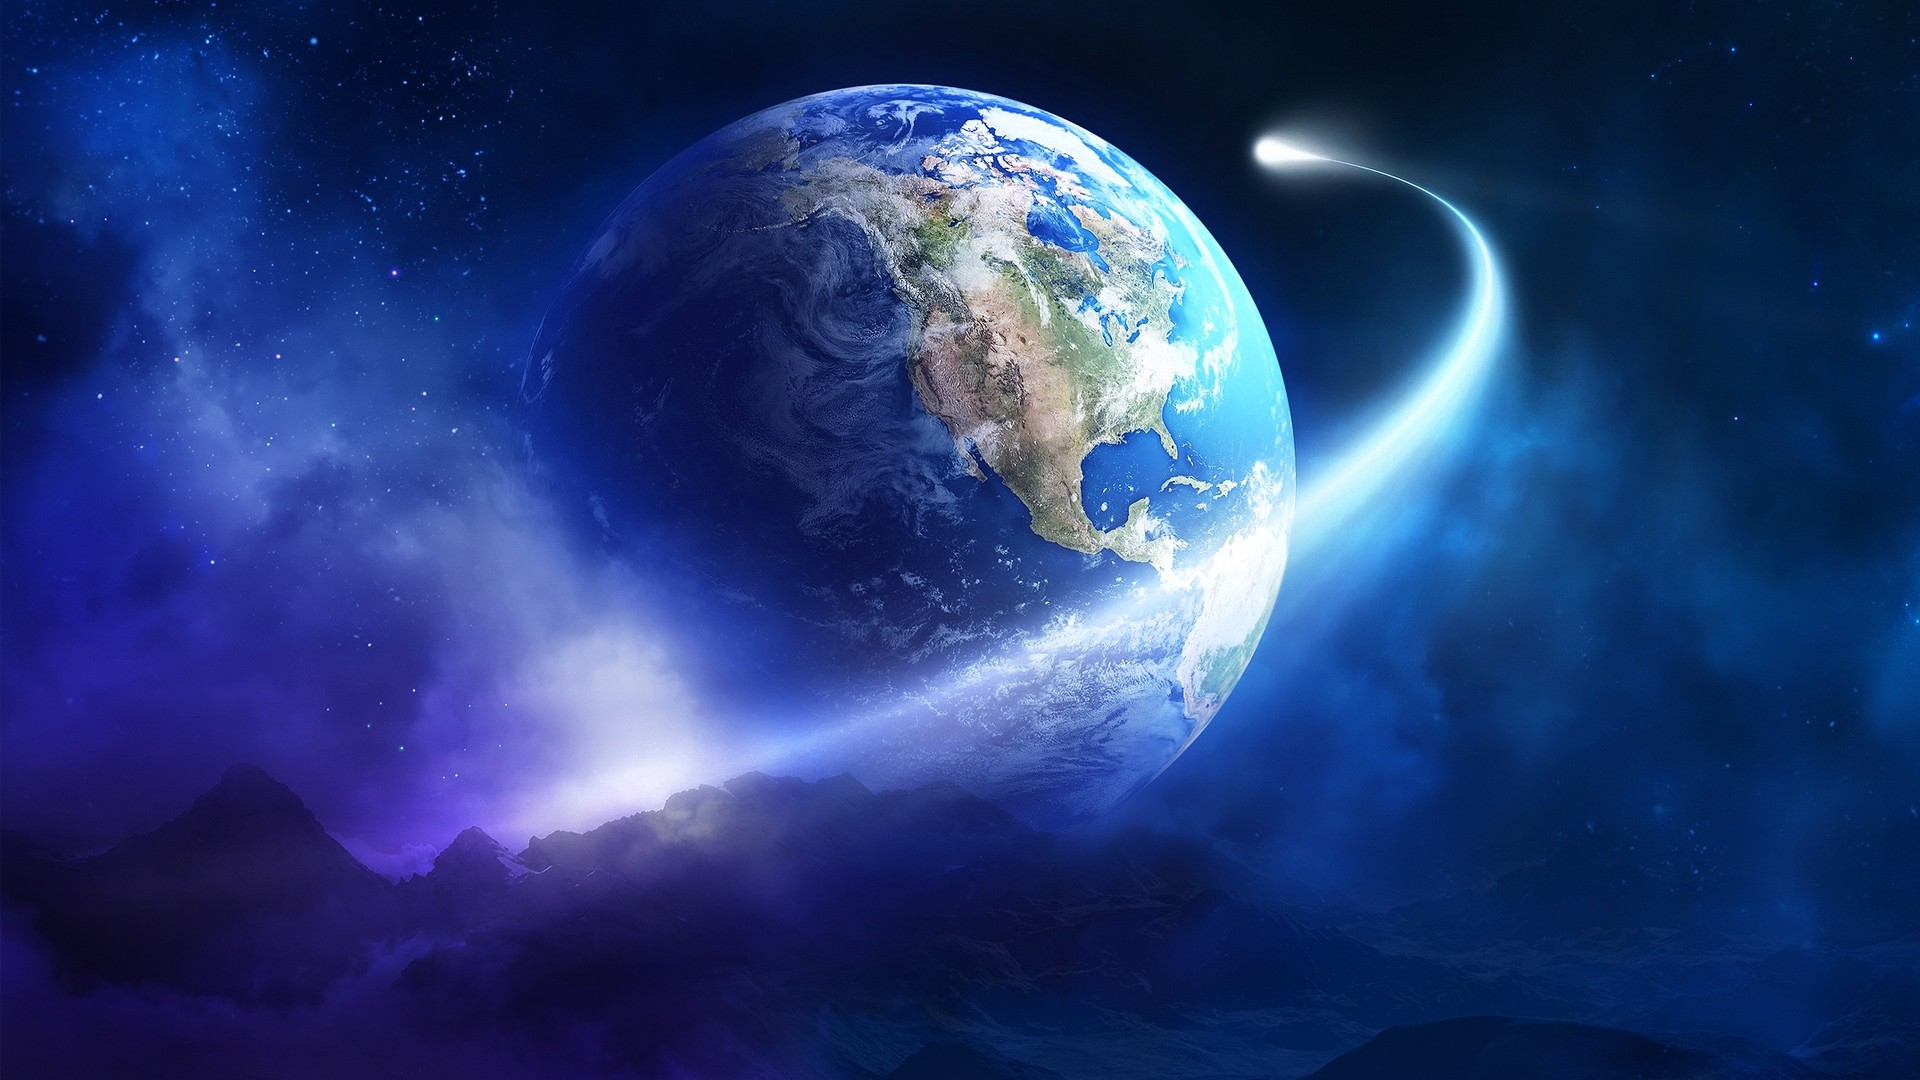 Cool Earth Backgrounds Ultra Hd Earth 4k 1920x1080 Wallpaper Teahub Io